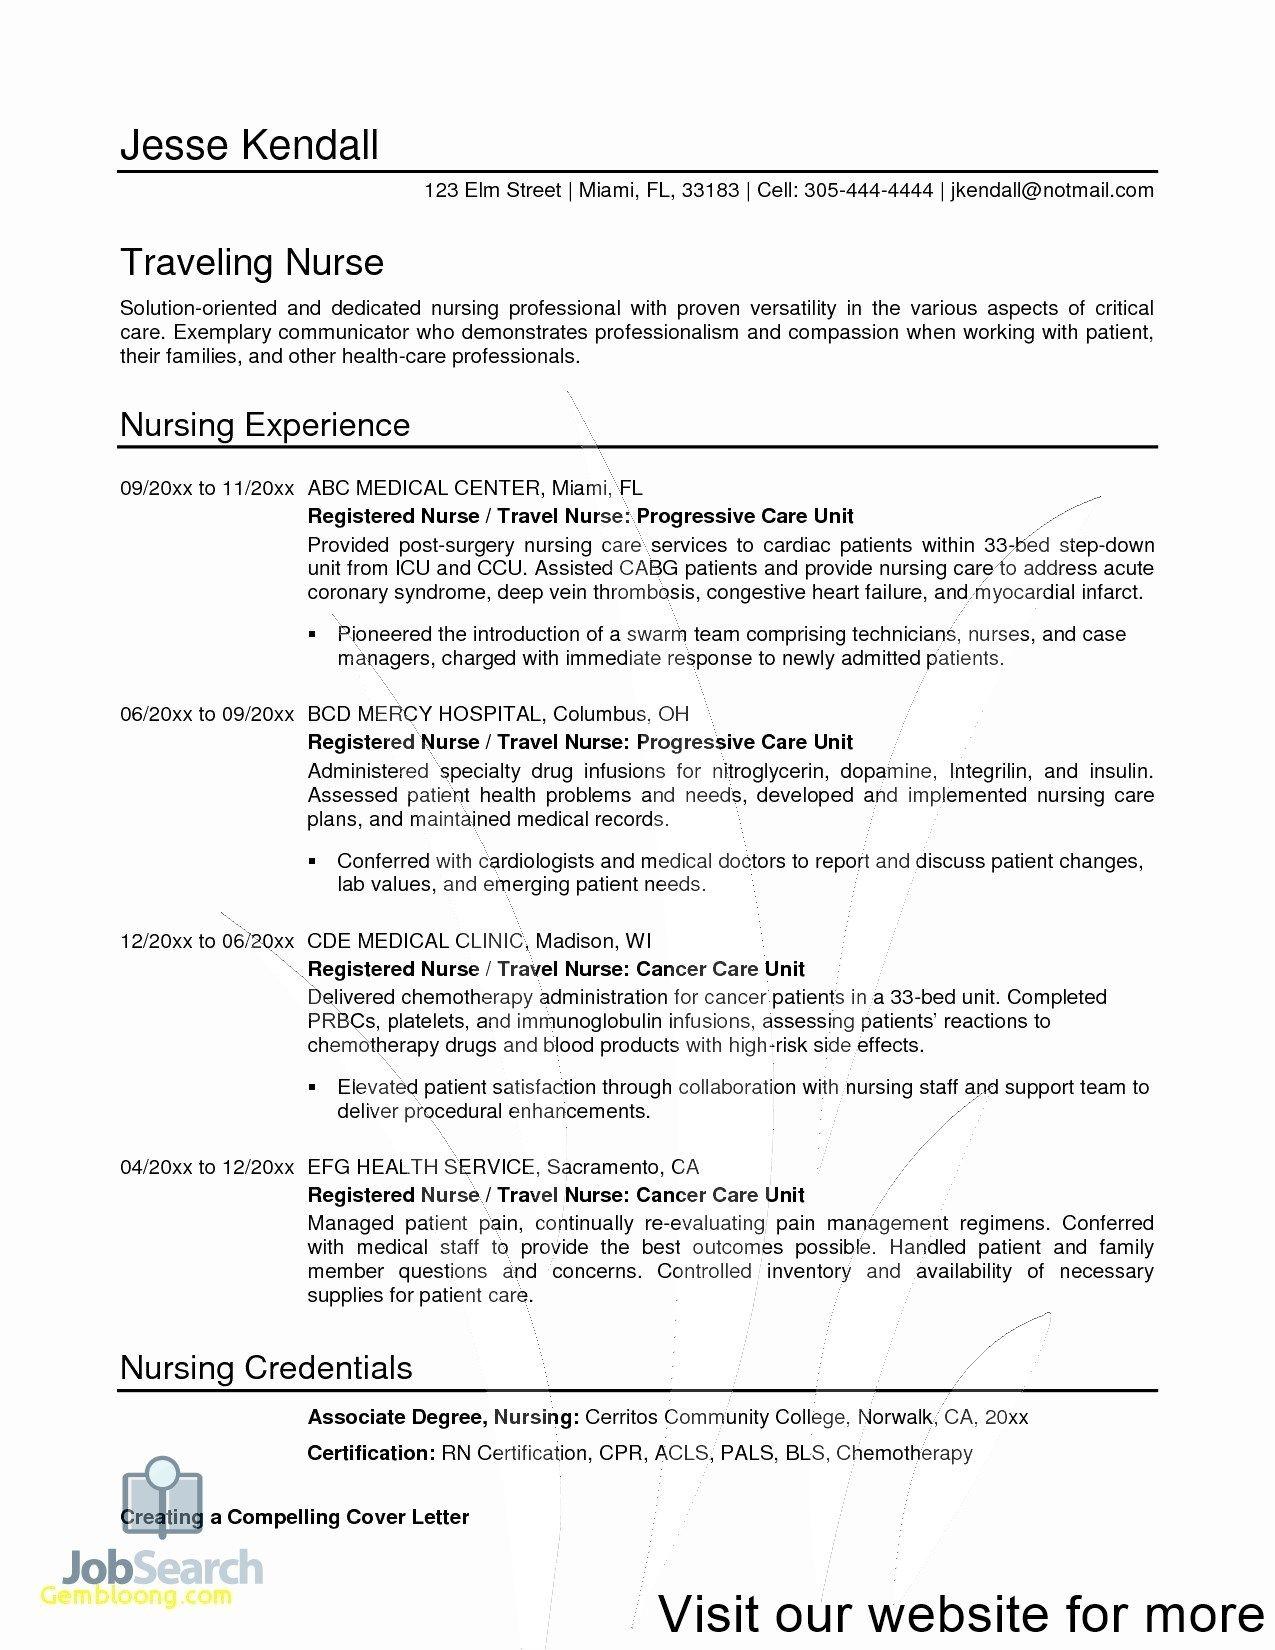 resume design template free in 2020 Registered nurse